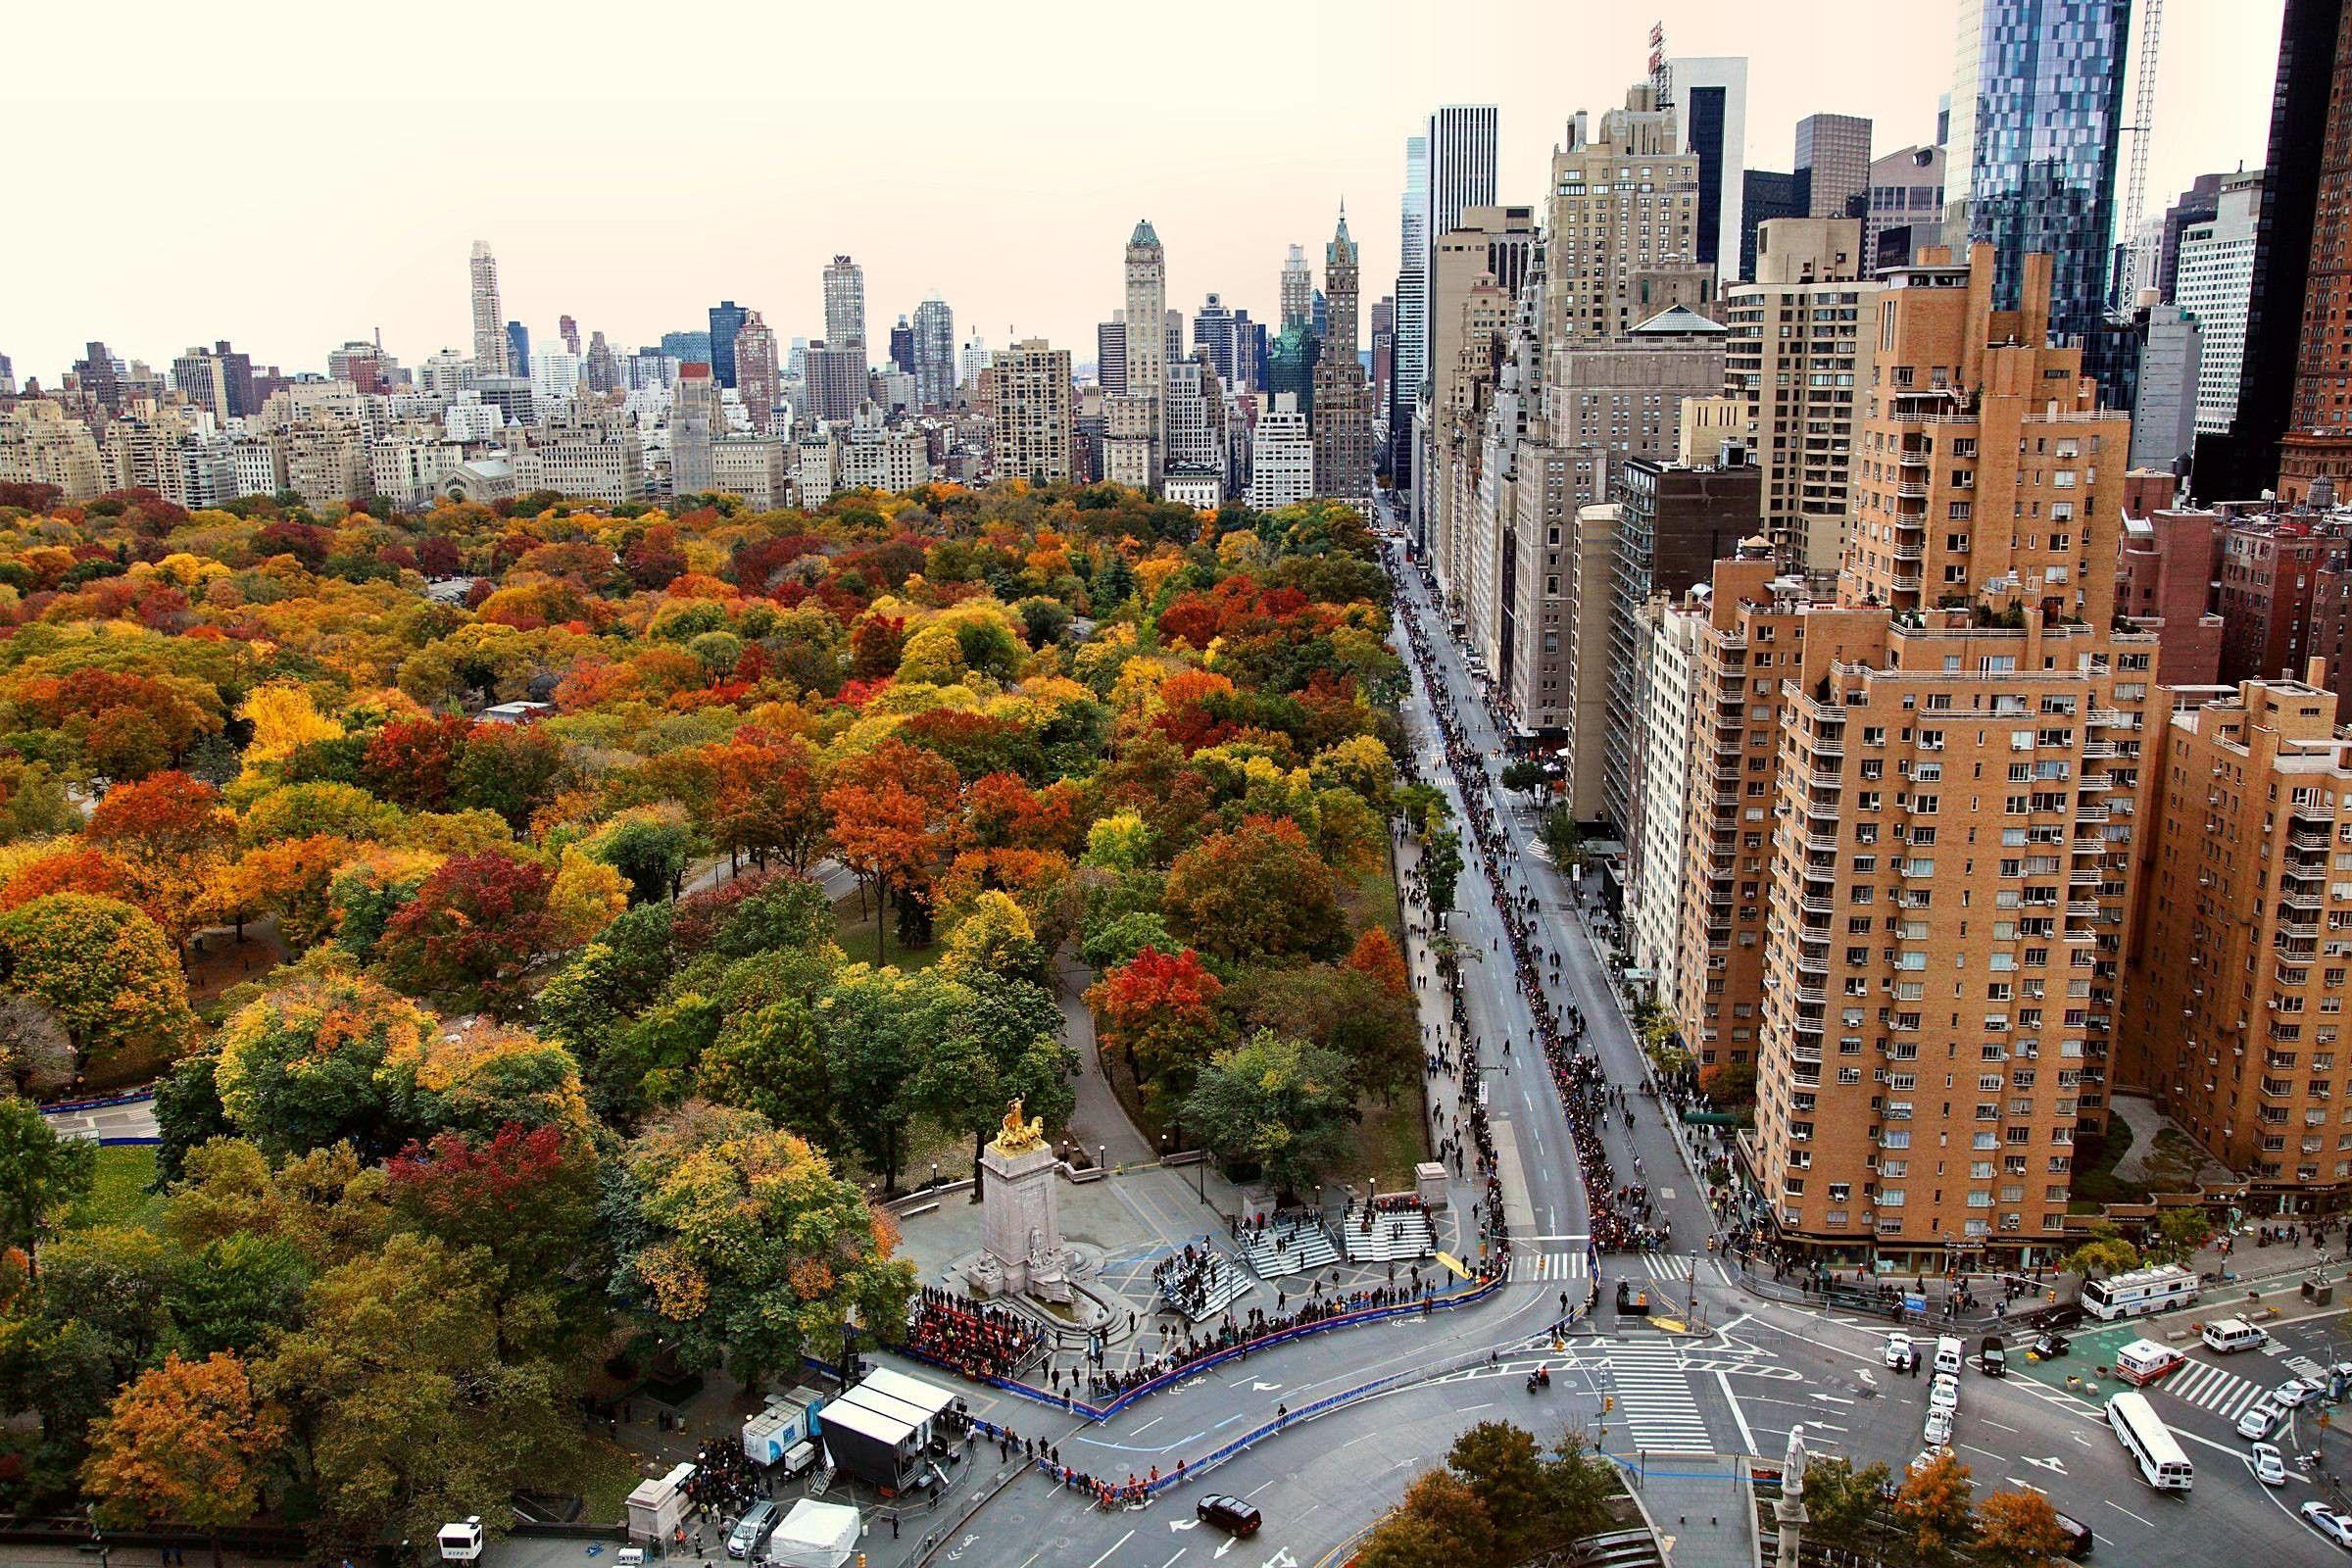 Image Result For Central Park Autumn In New York York Wallpaper Central Park